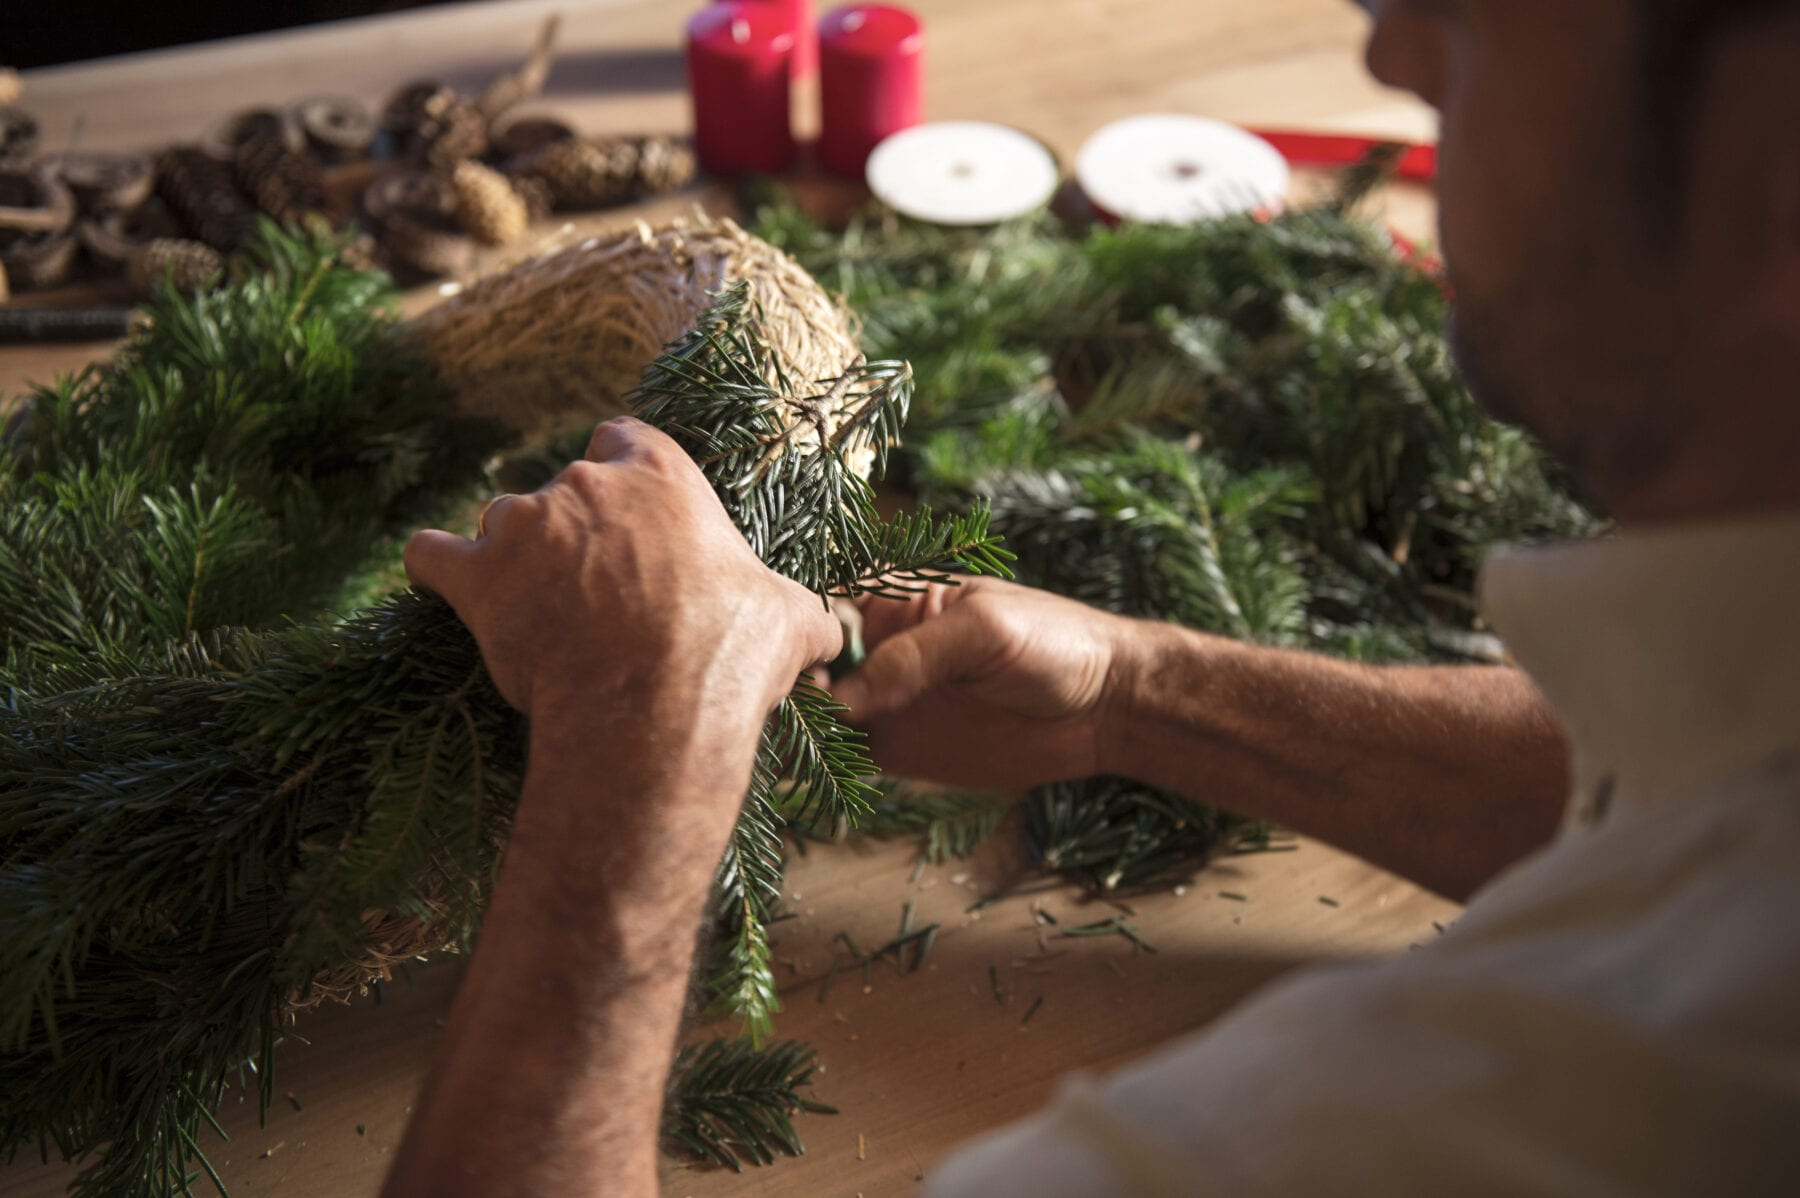 Zuid-Tiroolse Adventskrans kersttradities